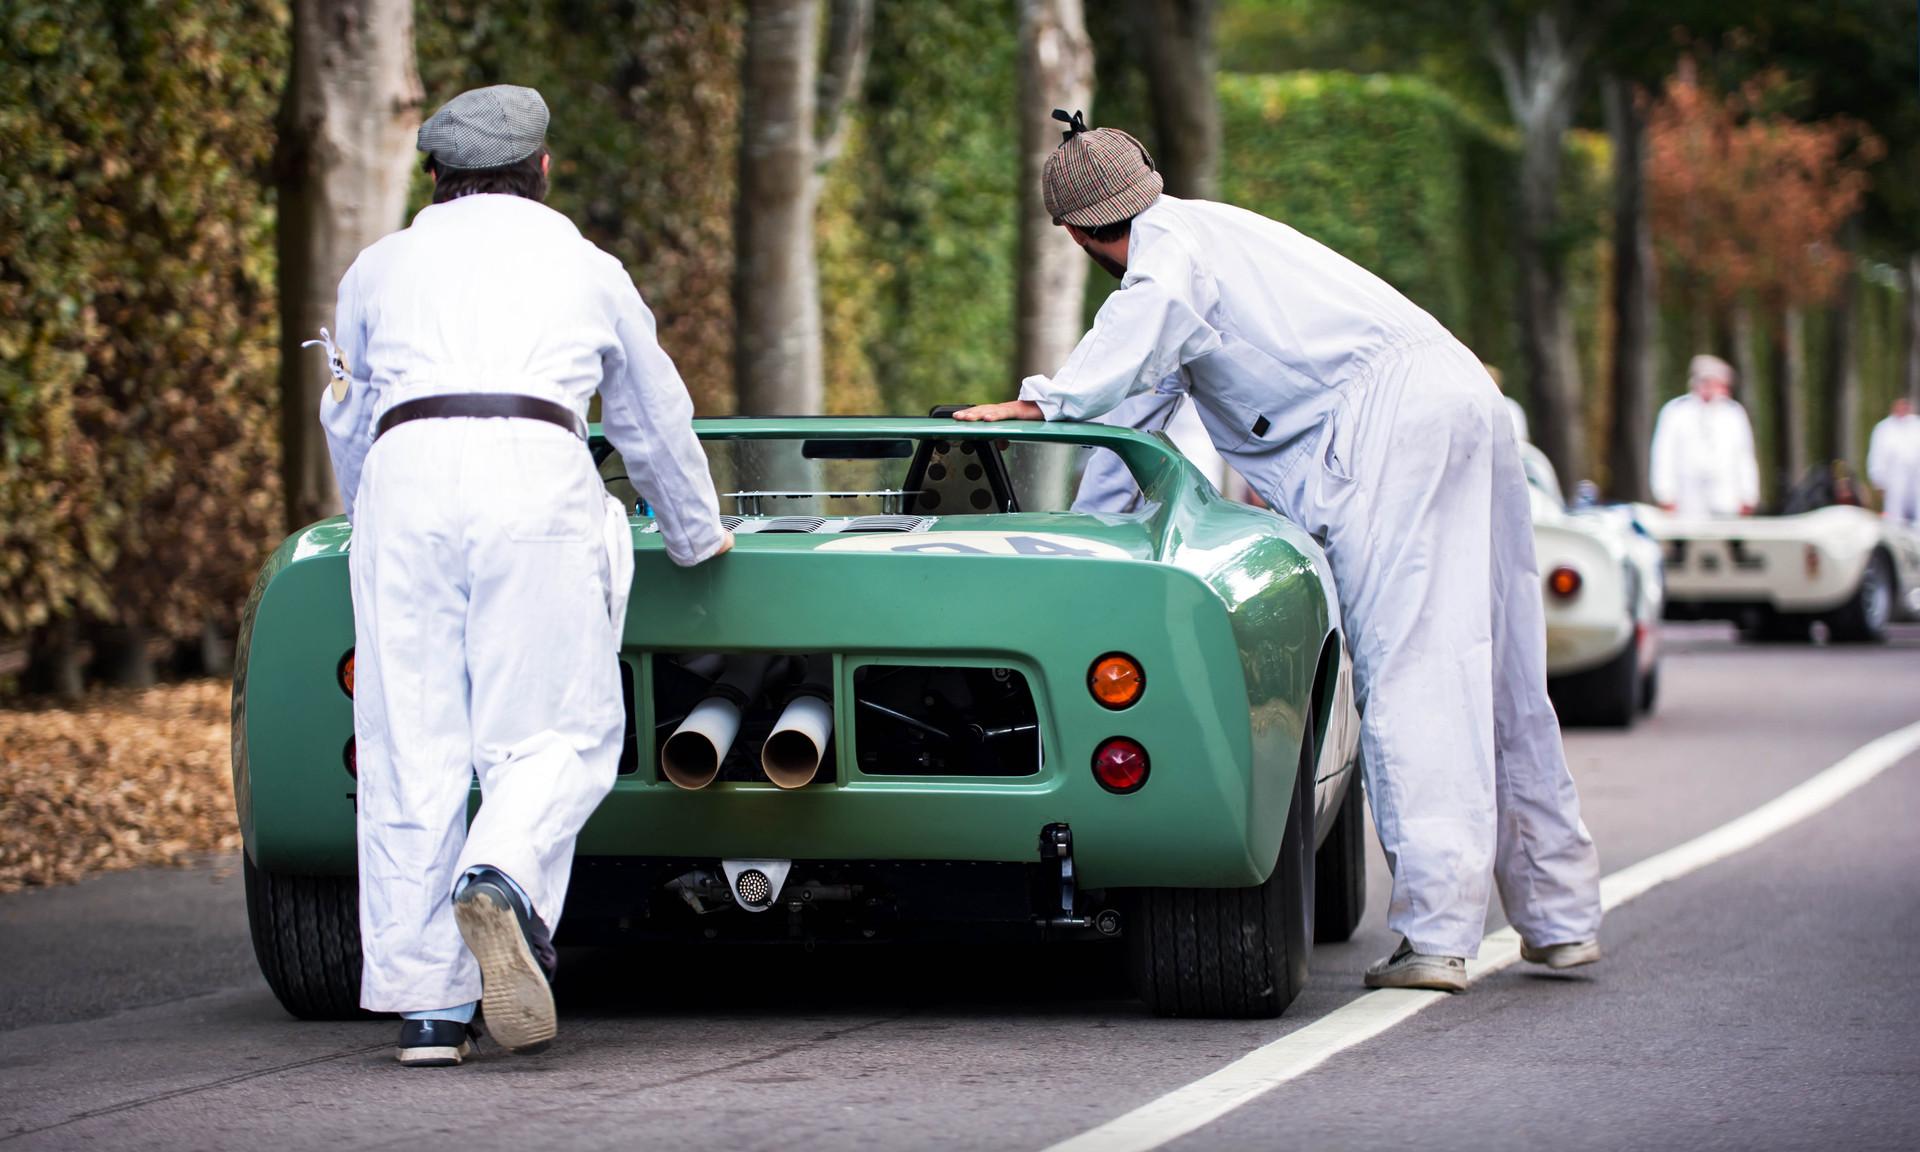 Rui Macedo Silva's 1965 Ford GT Roadster